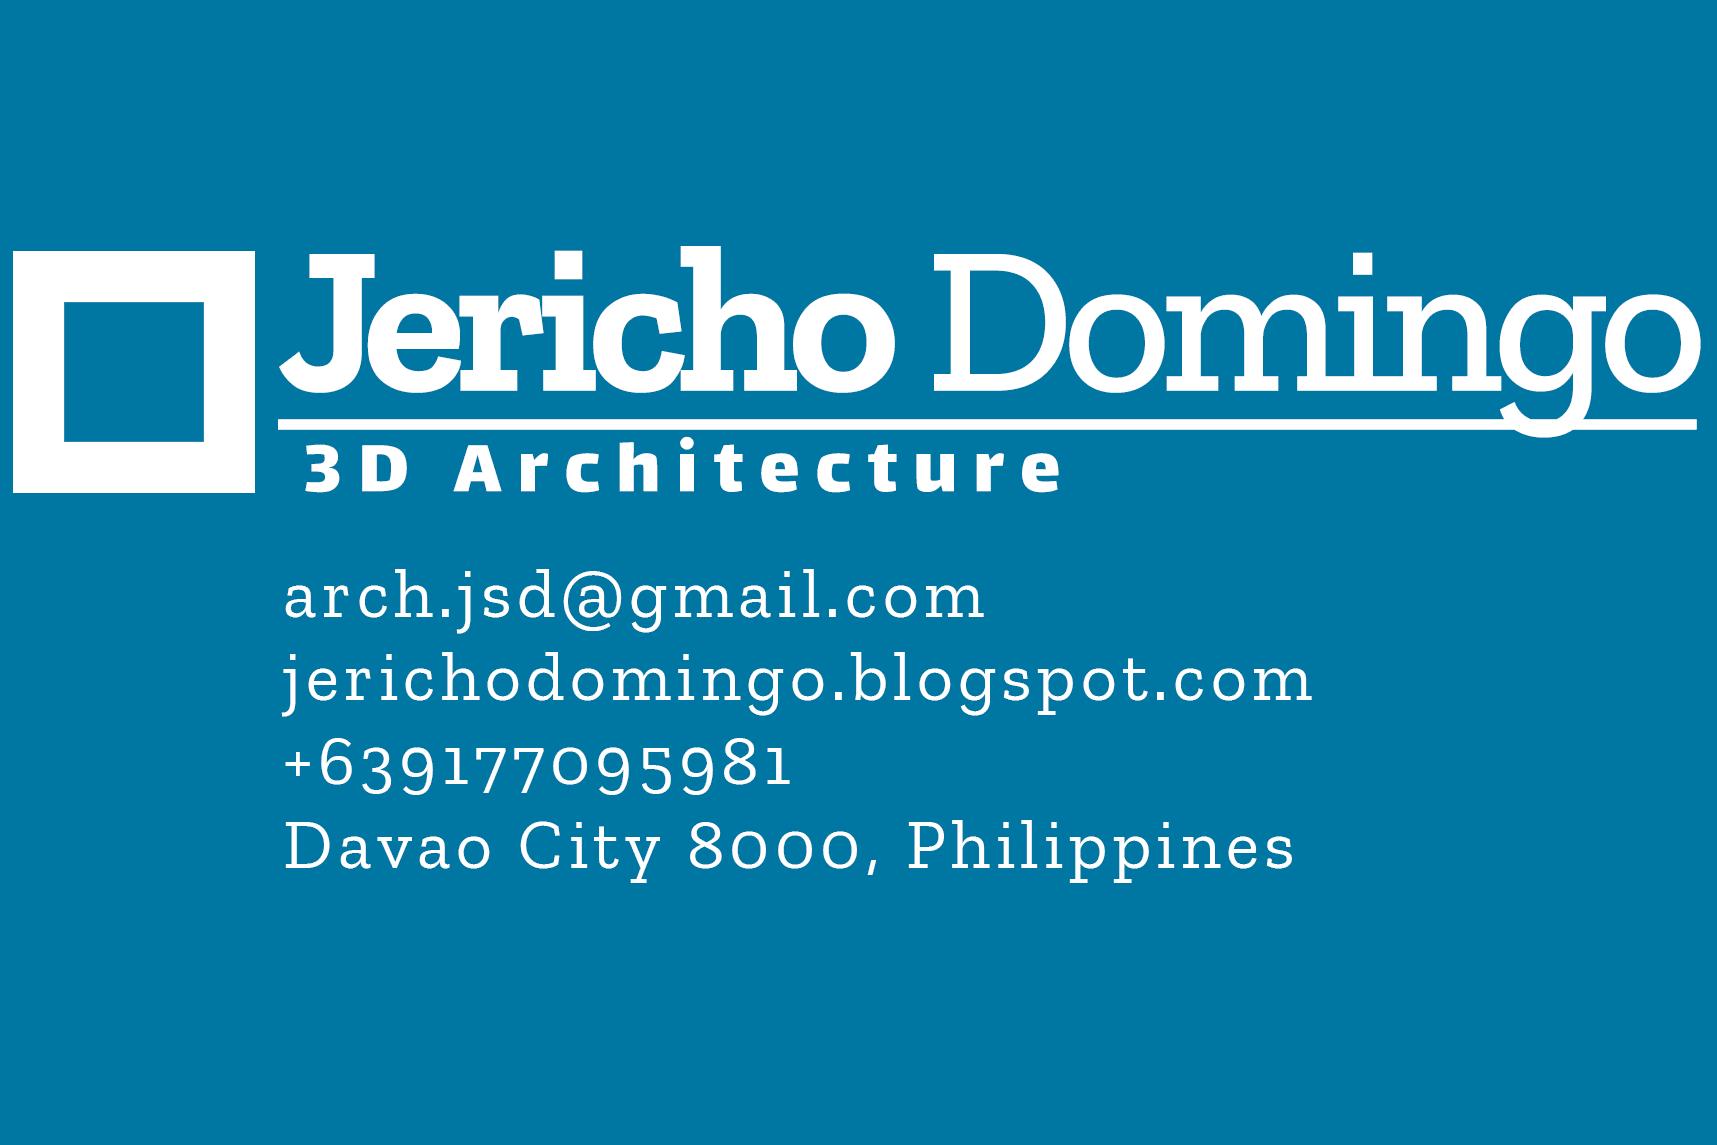 Portfolio for 3D Architectural Design & Rendering